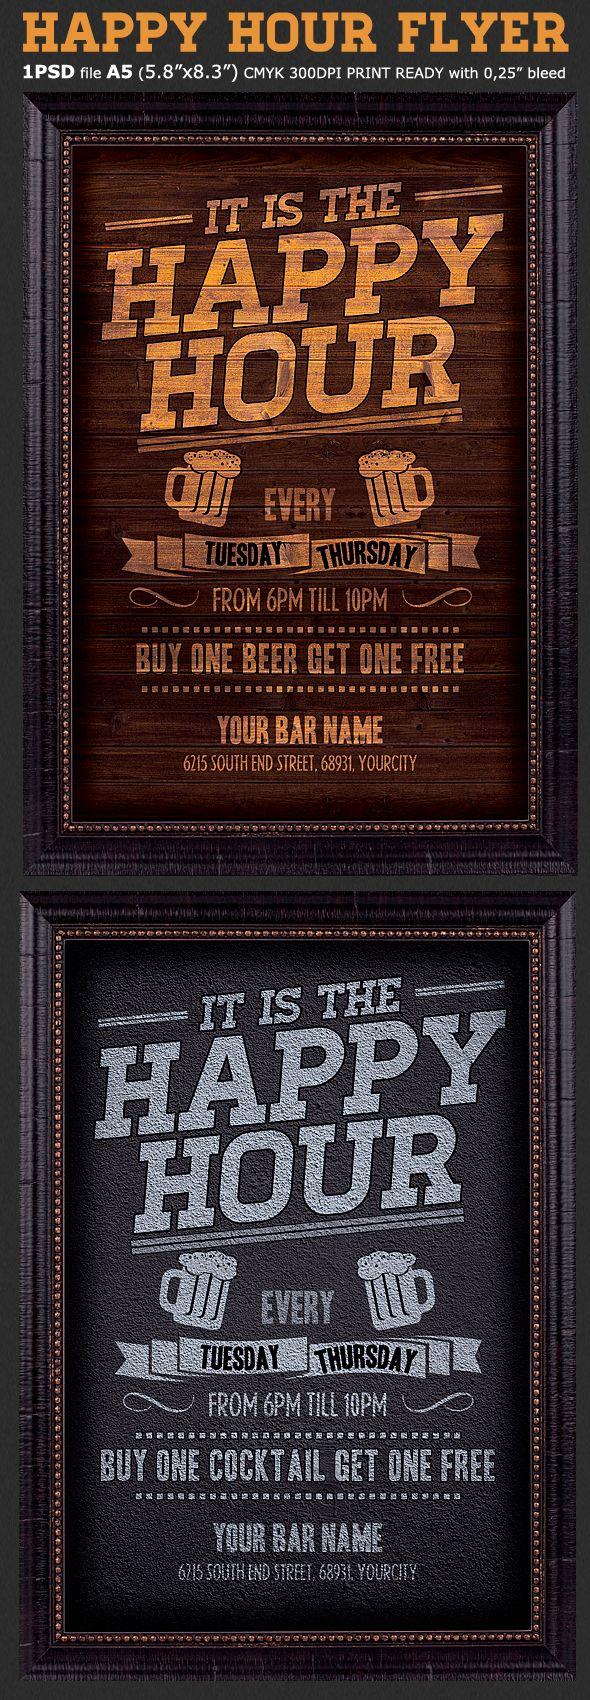 Happy Hour Flyer Template Flyer template, Restaurant